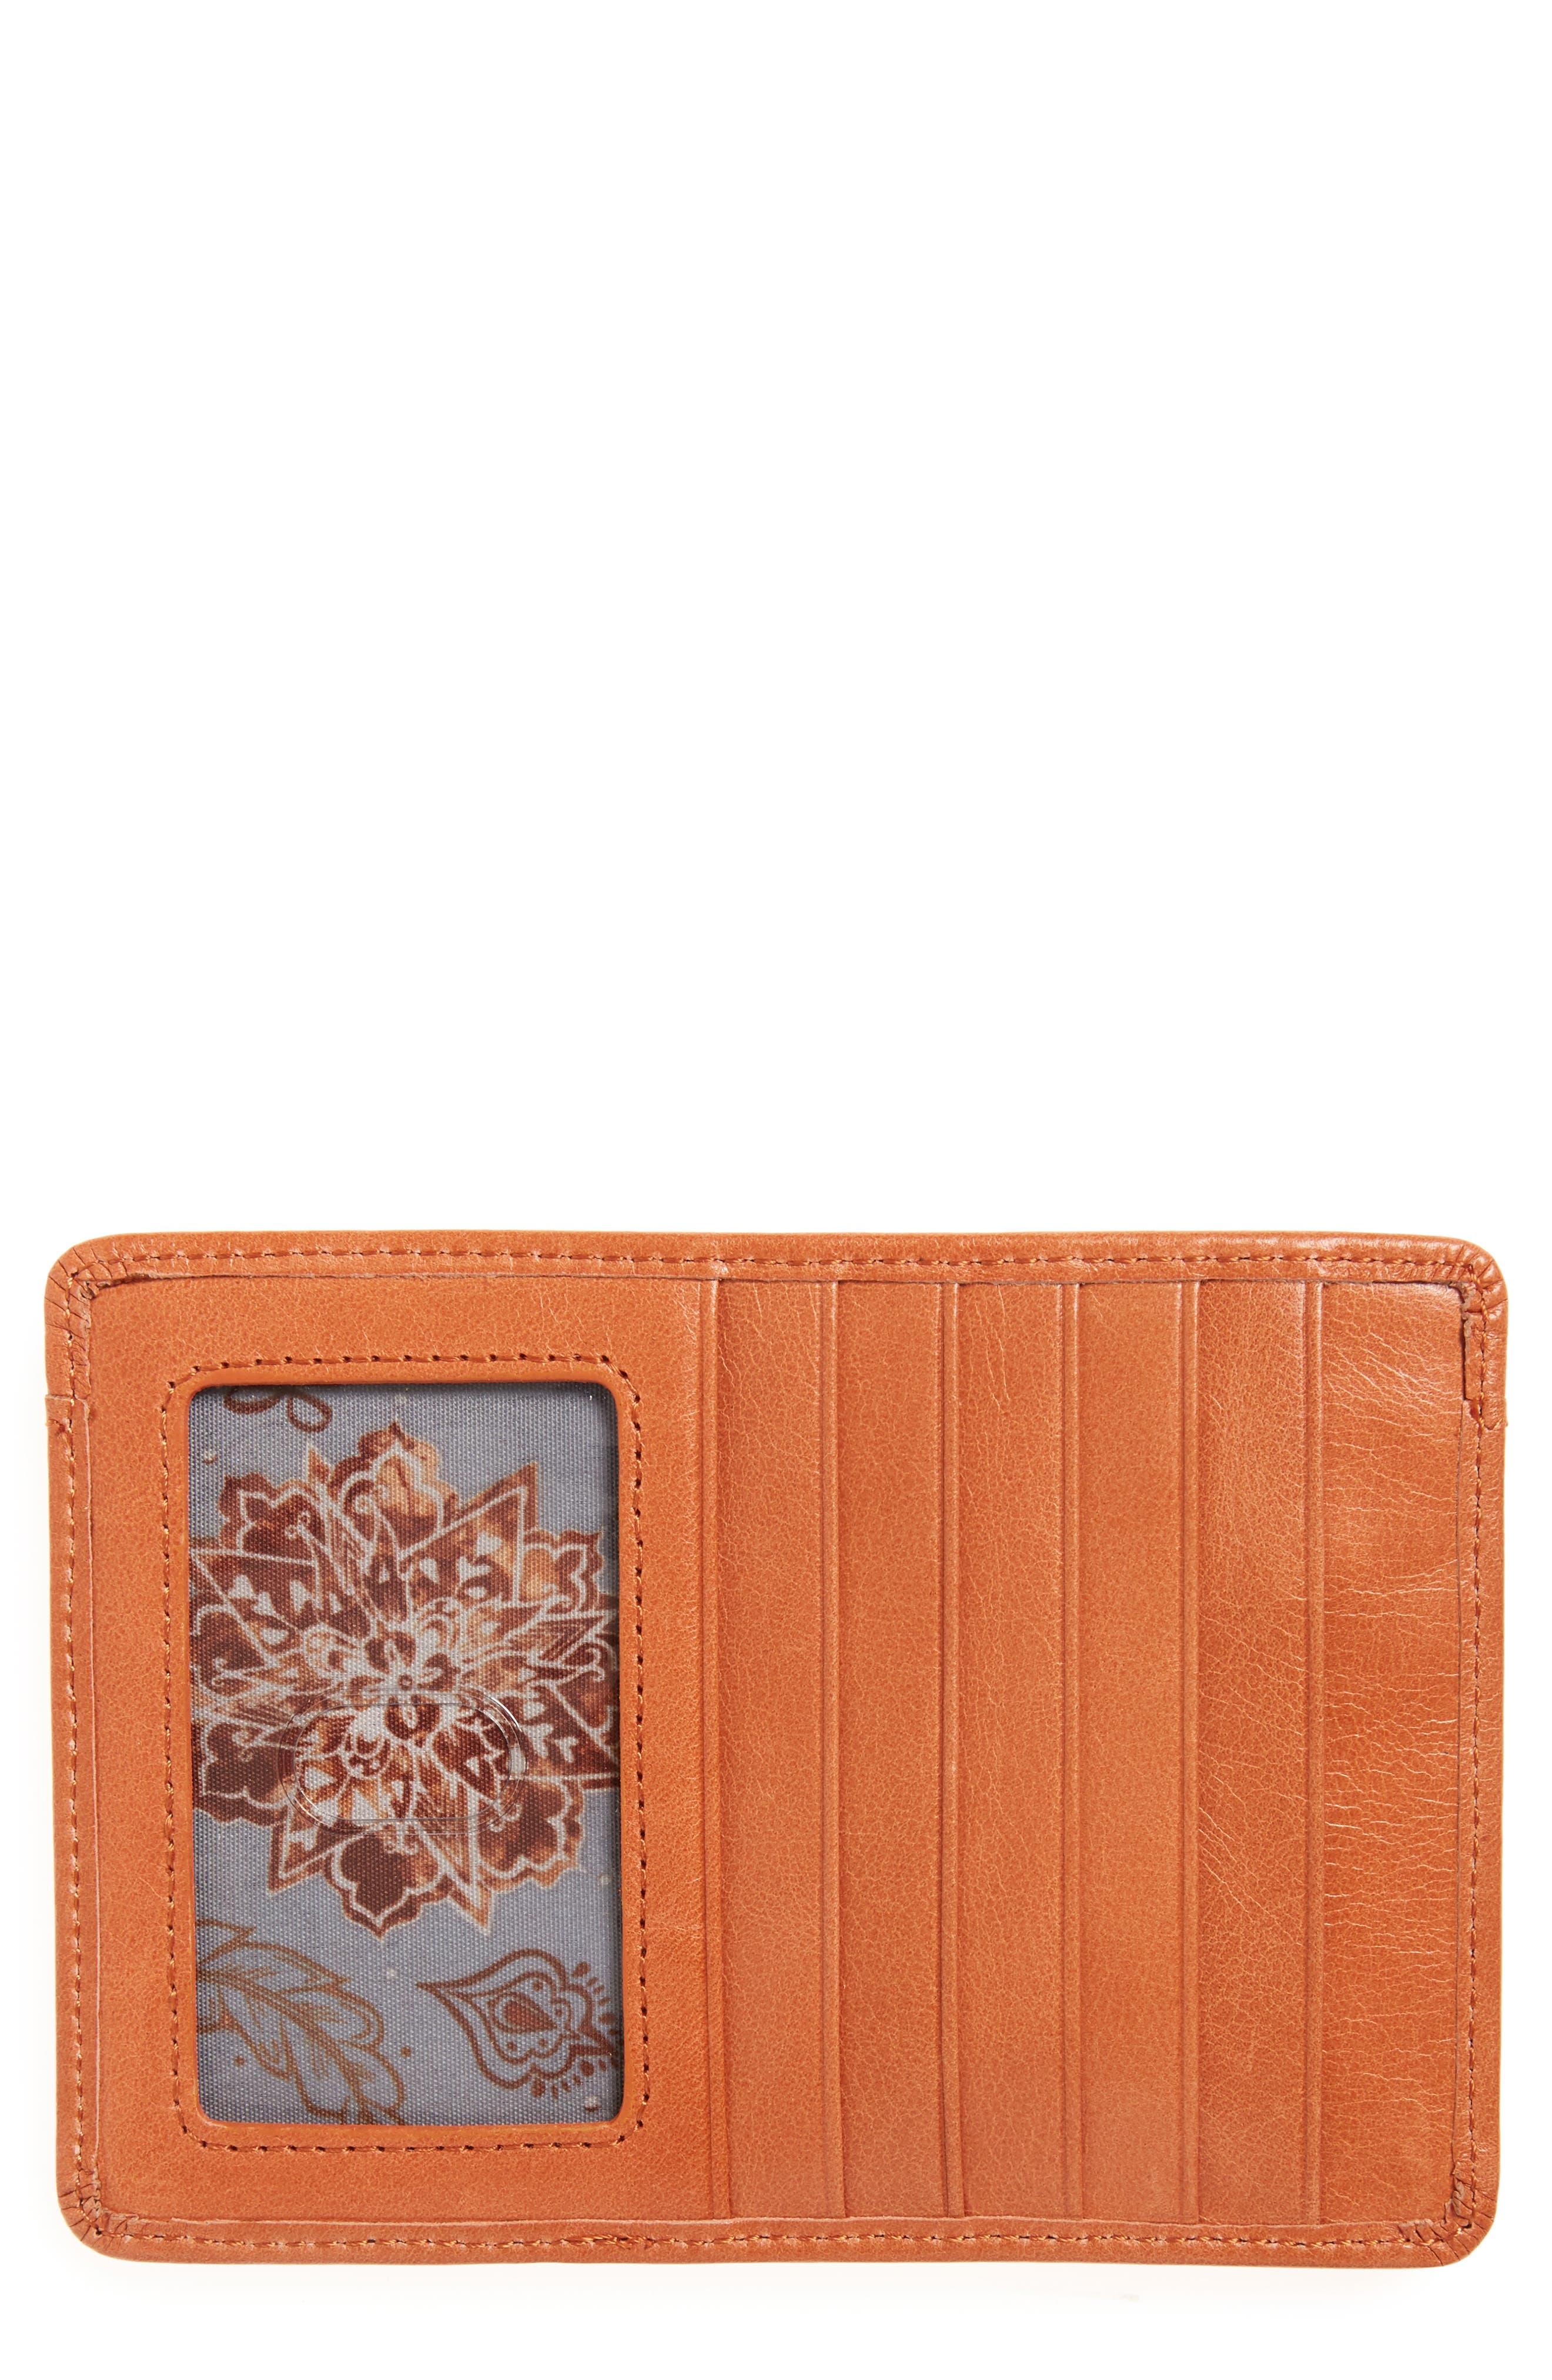 Image of Hobo Euro Slide Credit Card & Passport Case